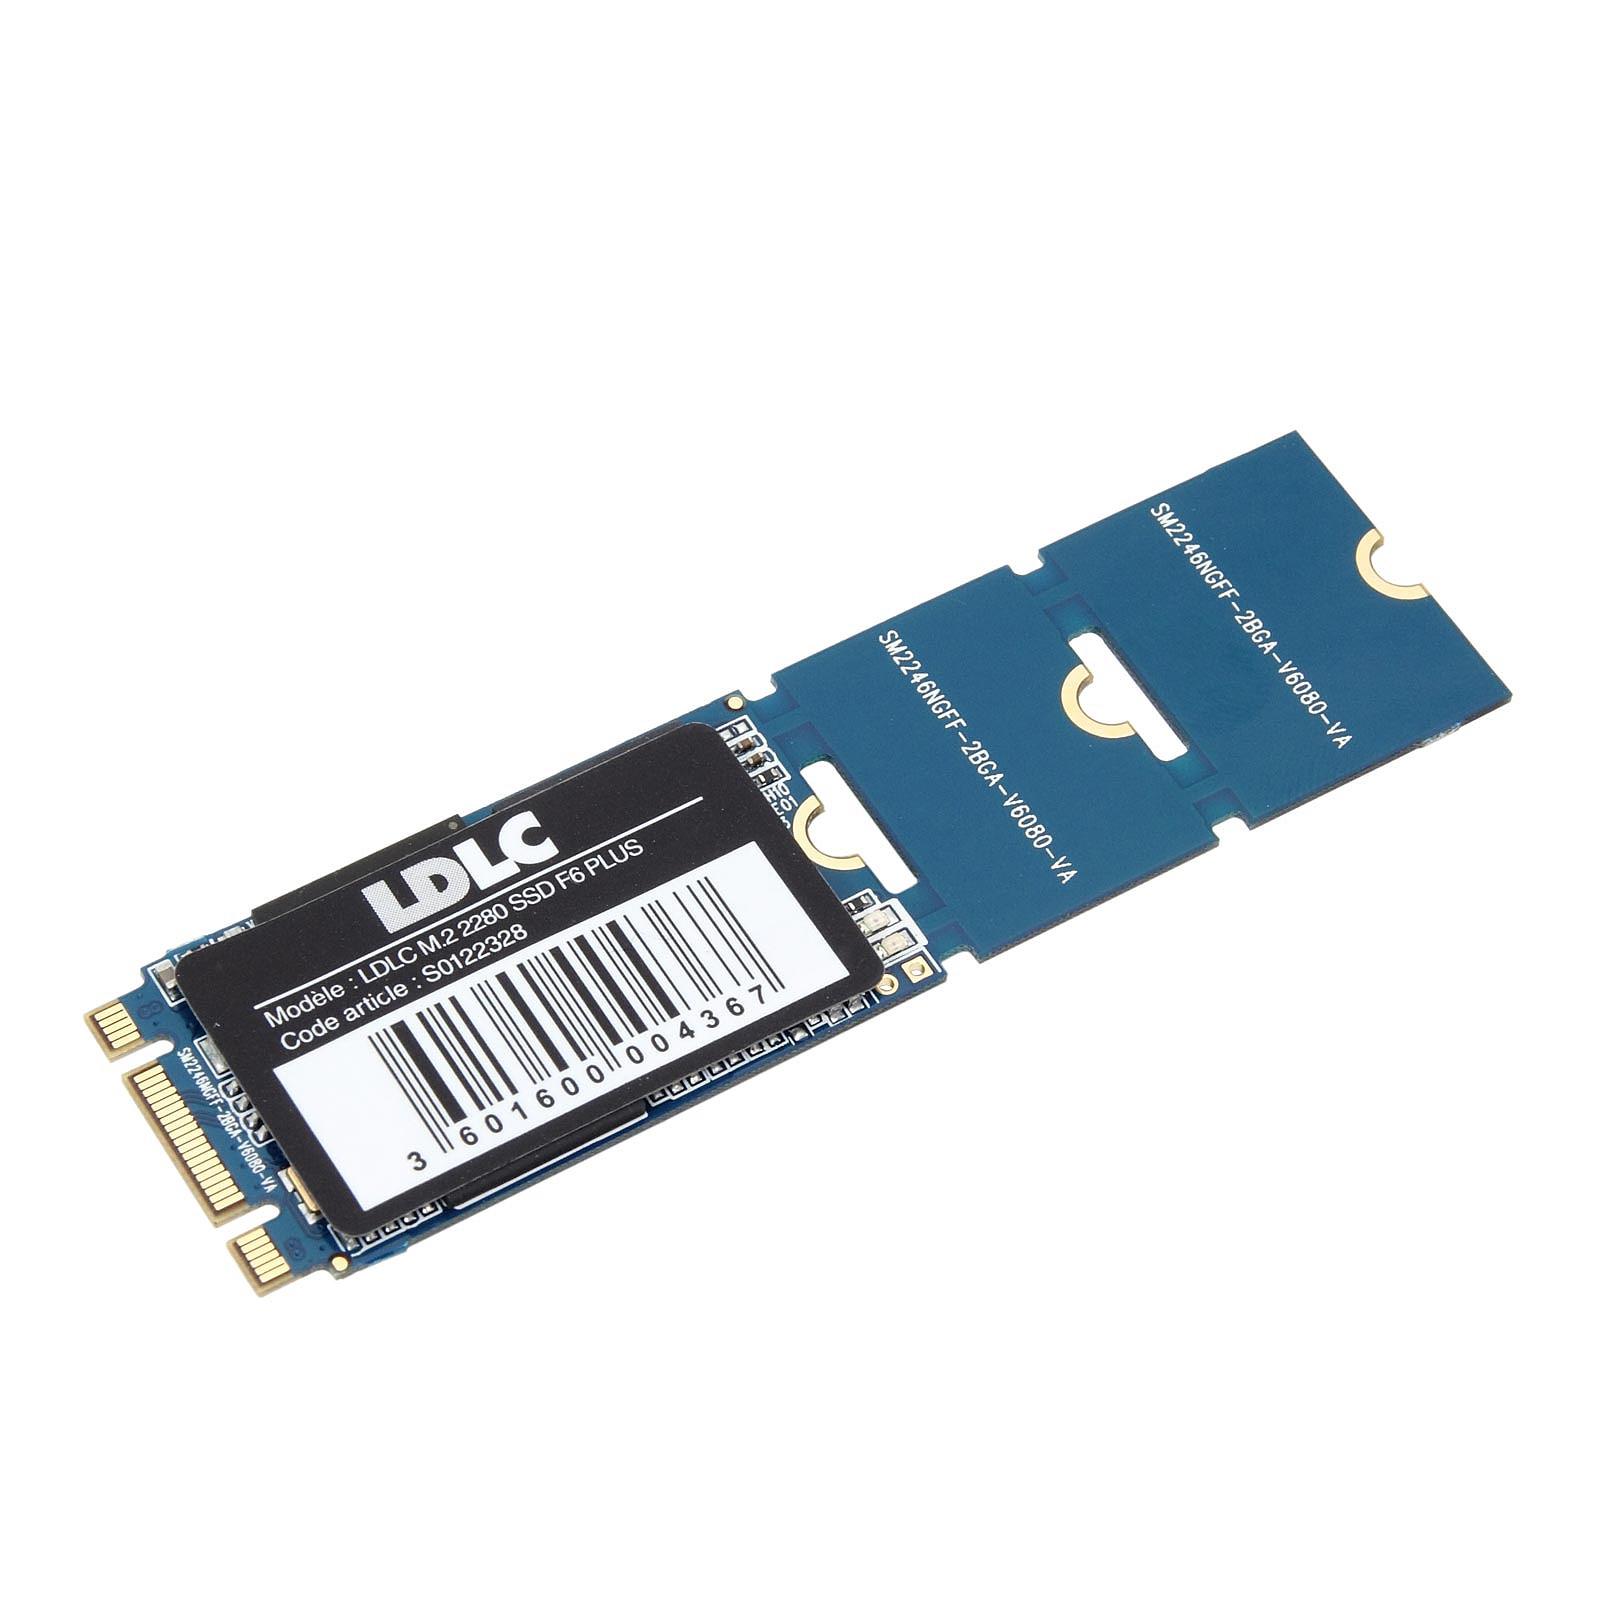 LDLC SSD M.2 2280 F6 PLUS 120 GB